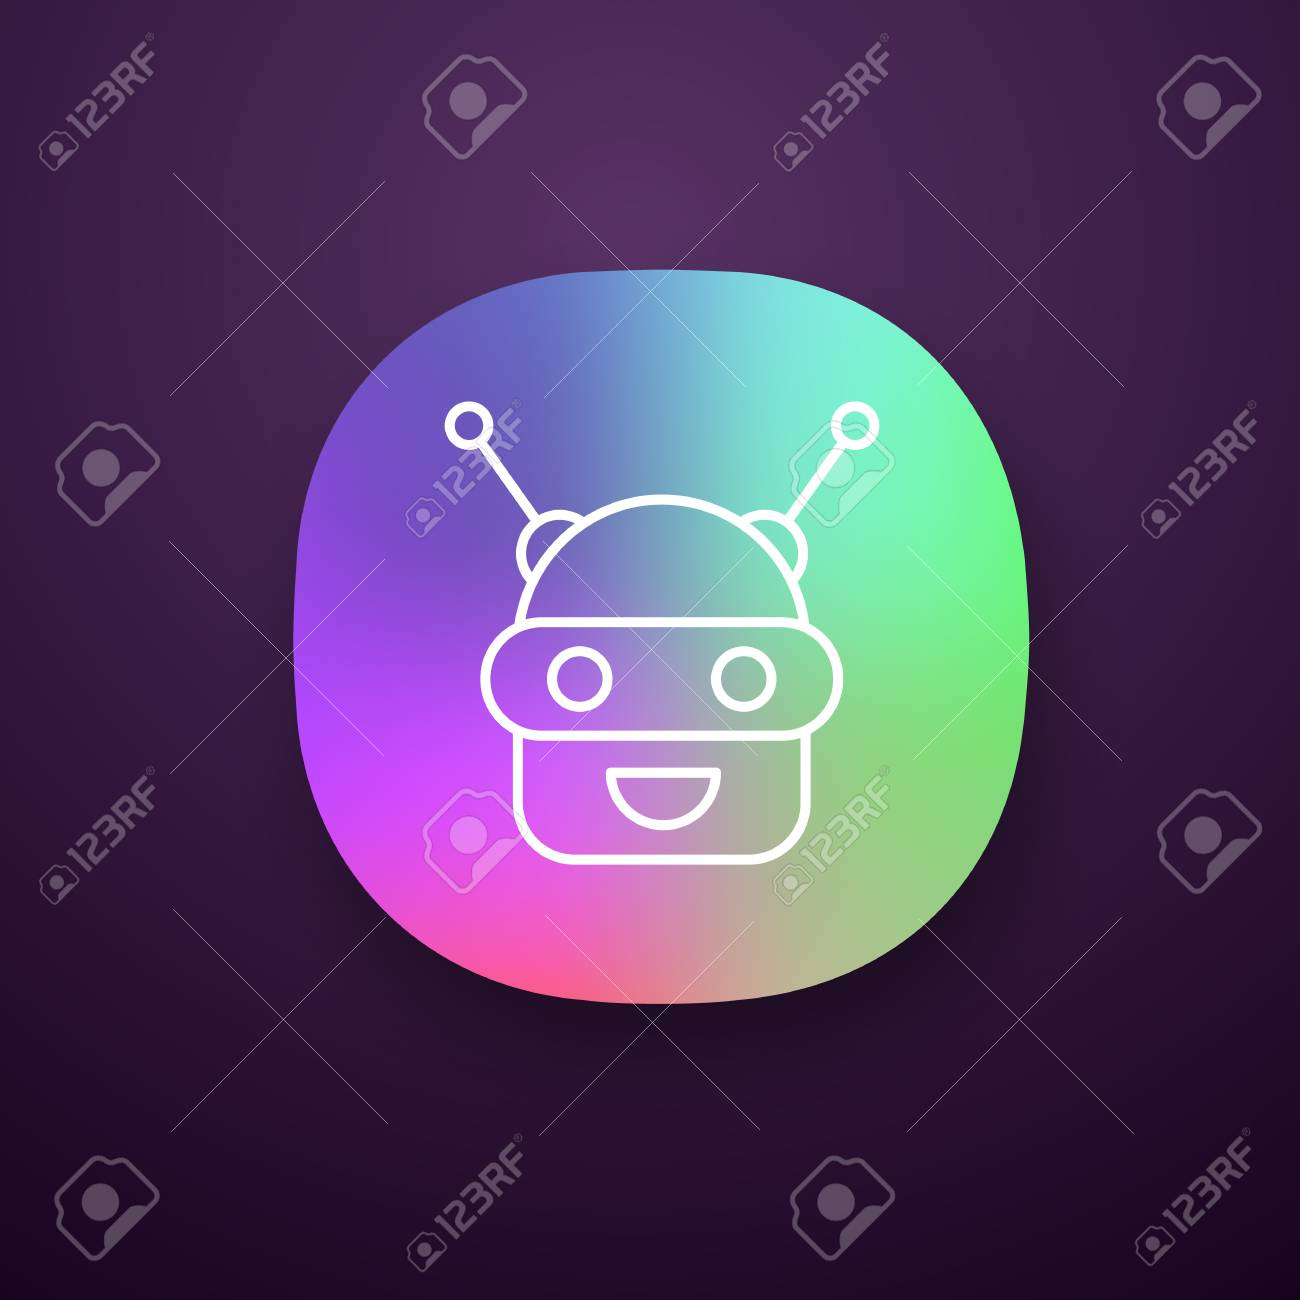 Chatbot app icon  UI/UX user interface  Talkbot  Modern robot